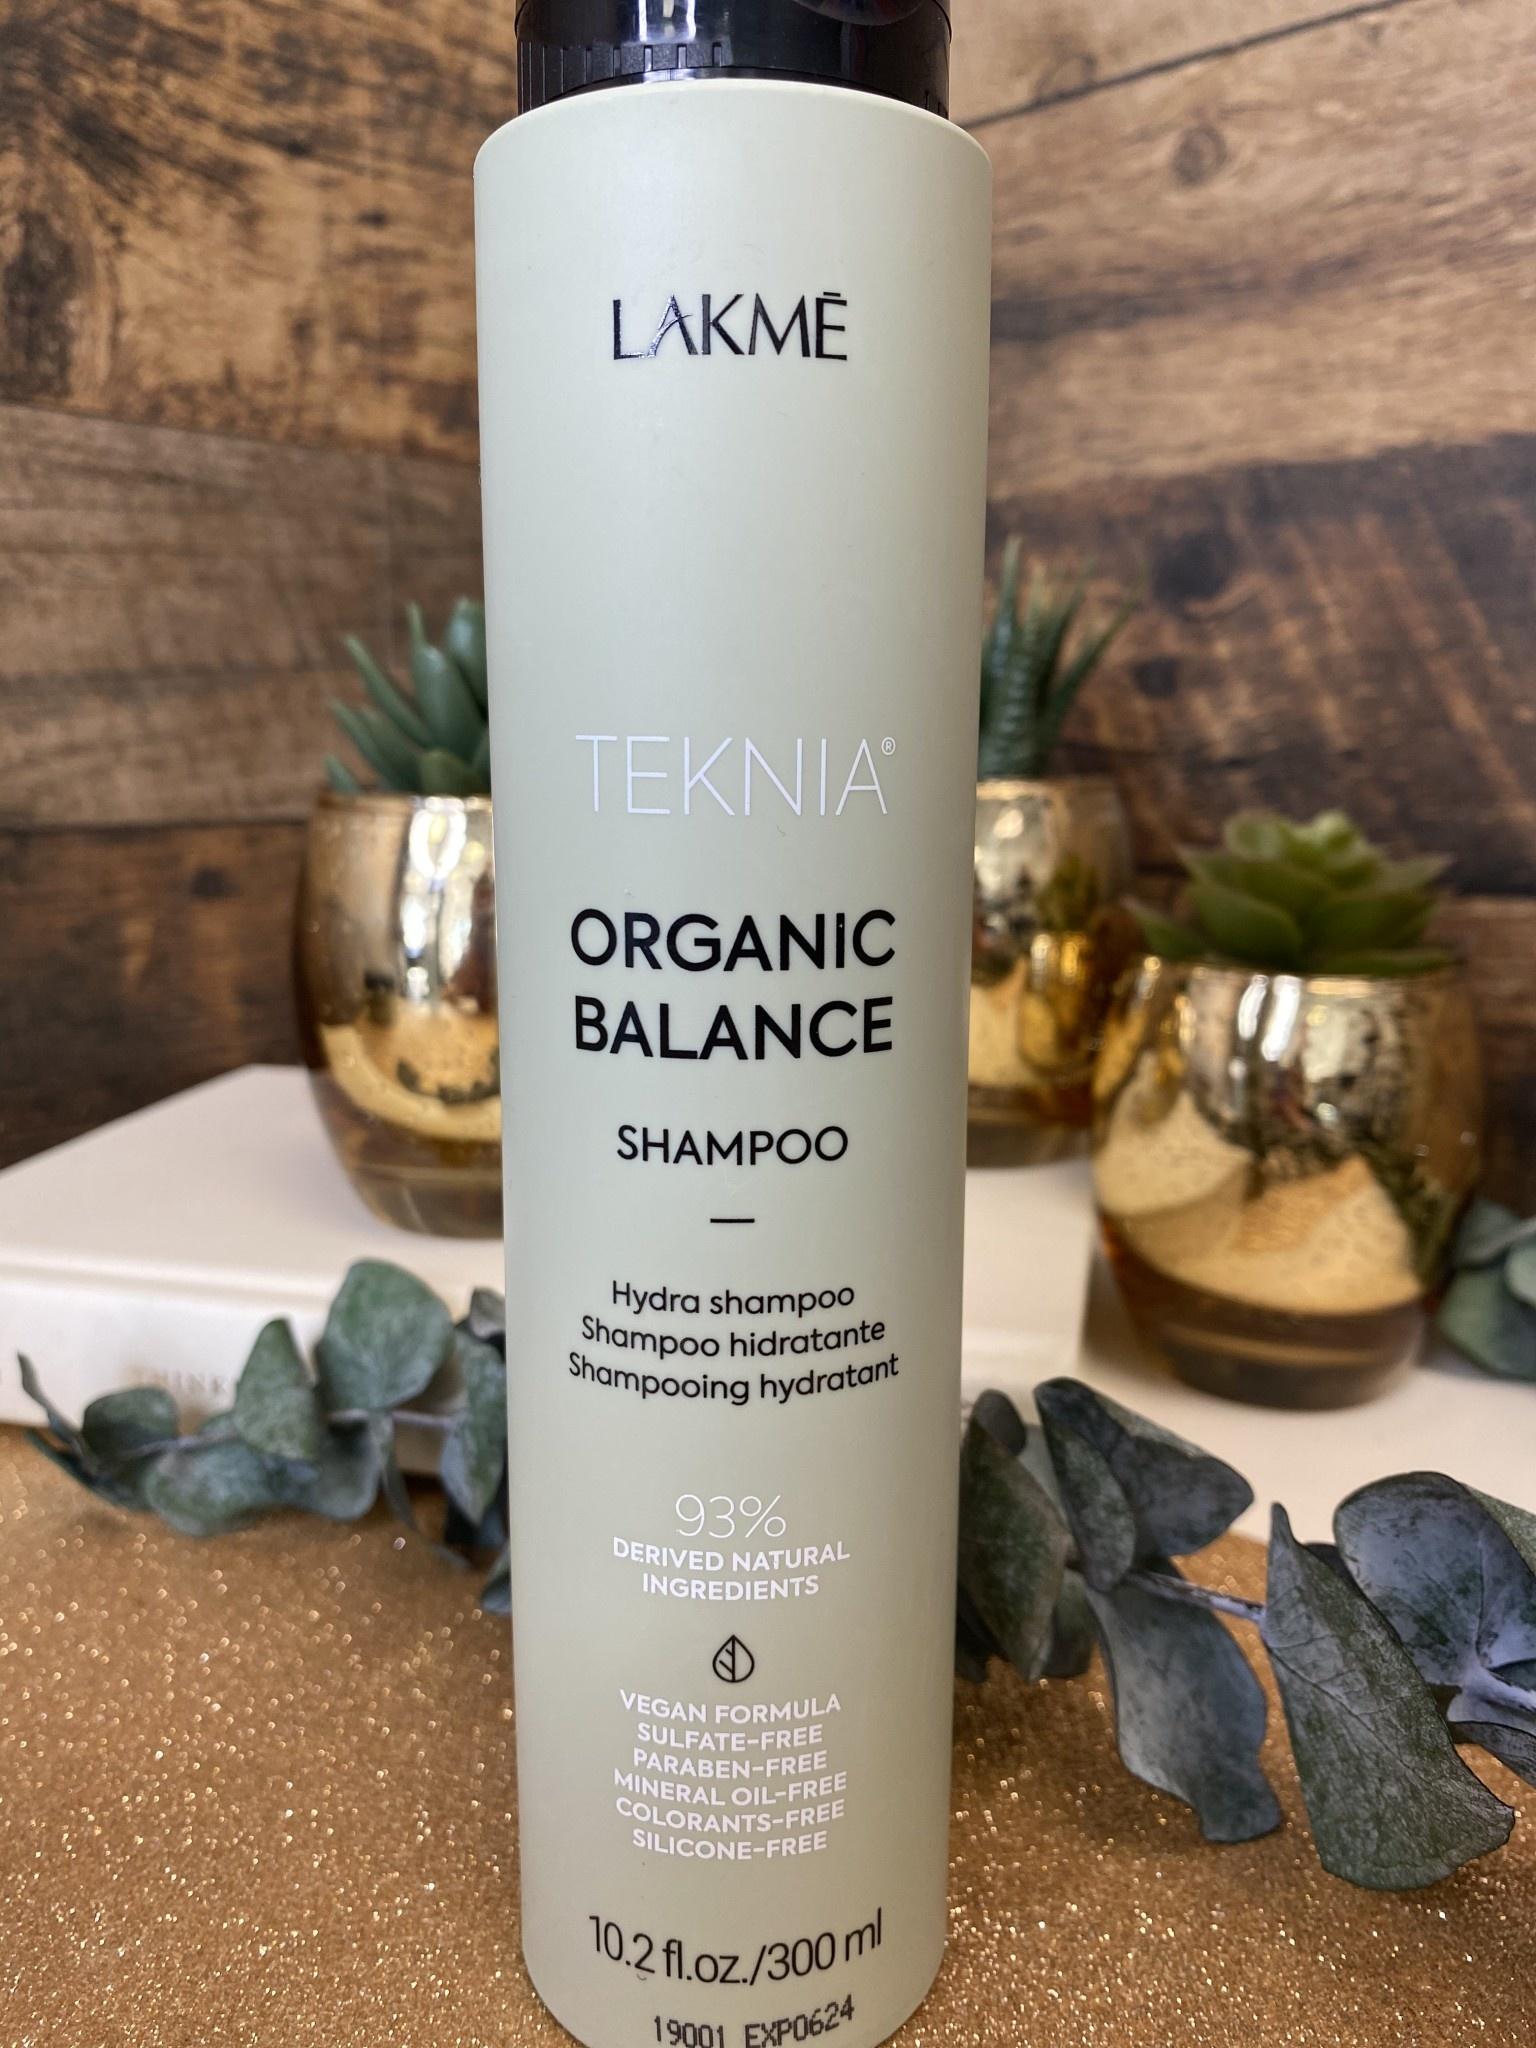 Lakmé TEKNIA organic balance shampooing 300ml